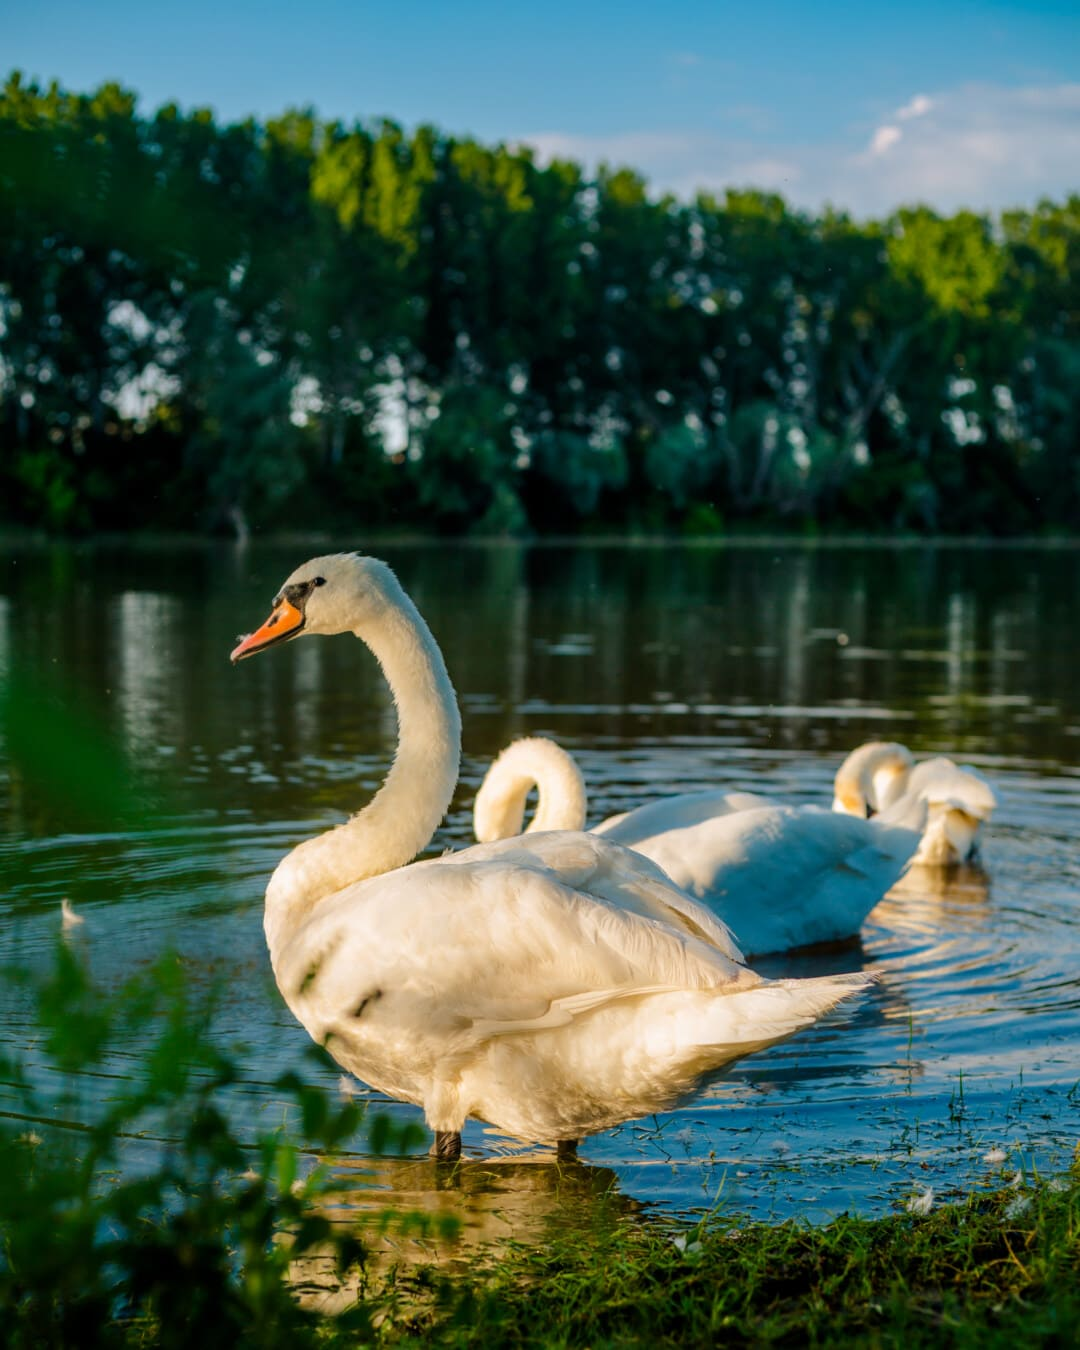 flock, swan, bird family, birds, sunny, lakeside, water, aquatic bird, swimming, waterfowl